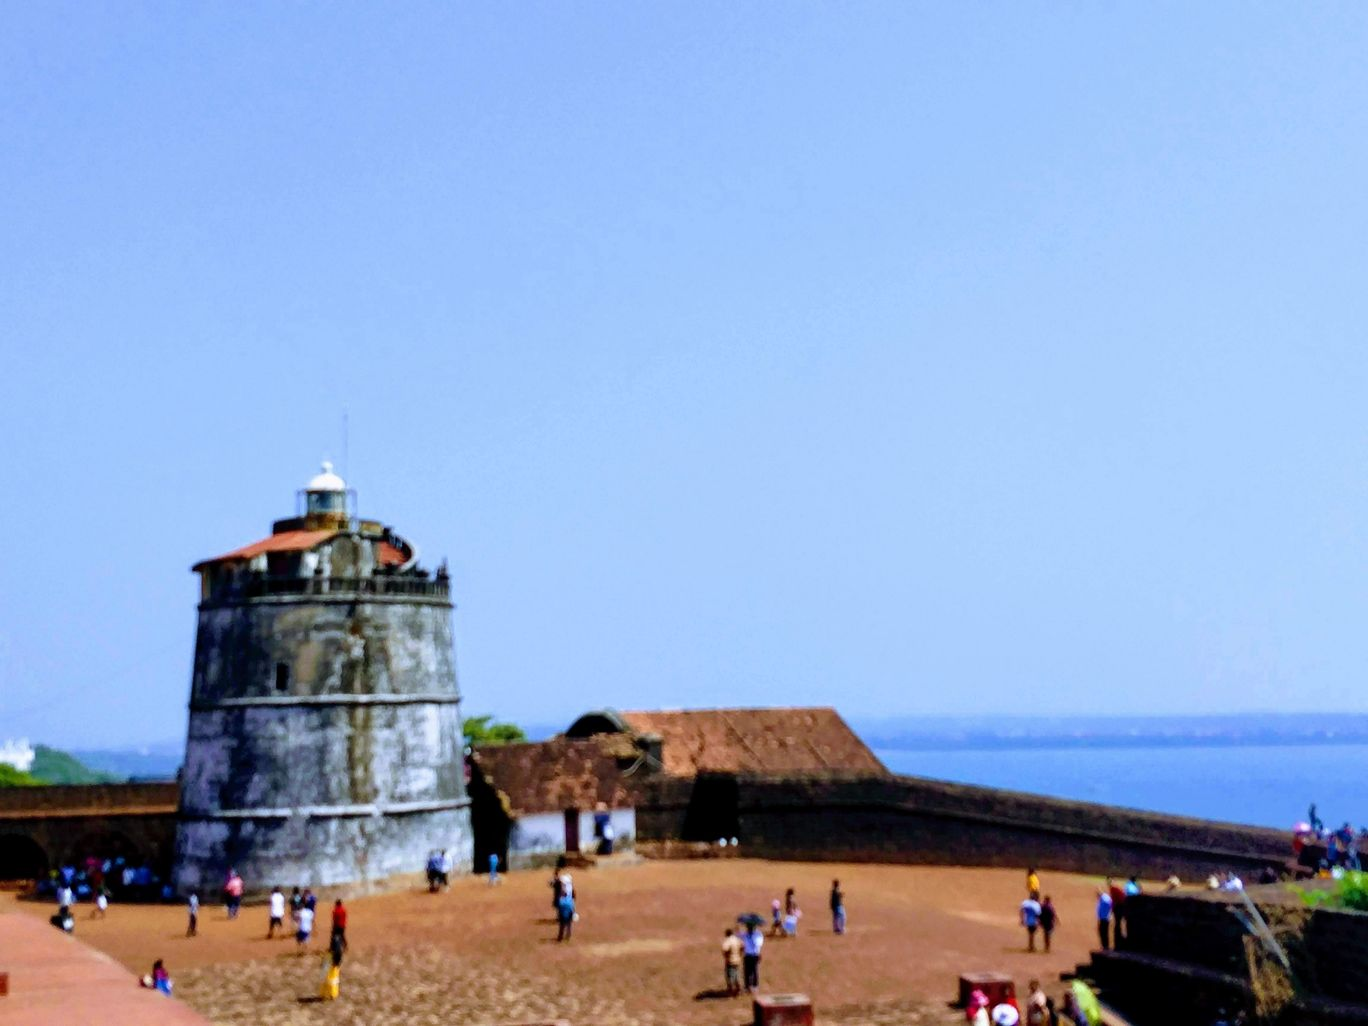 Photo of Goa By Unplugged_kk